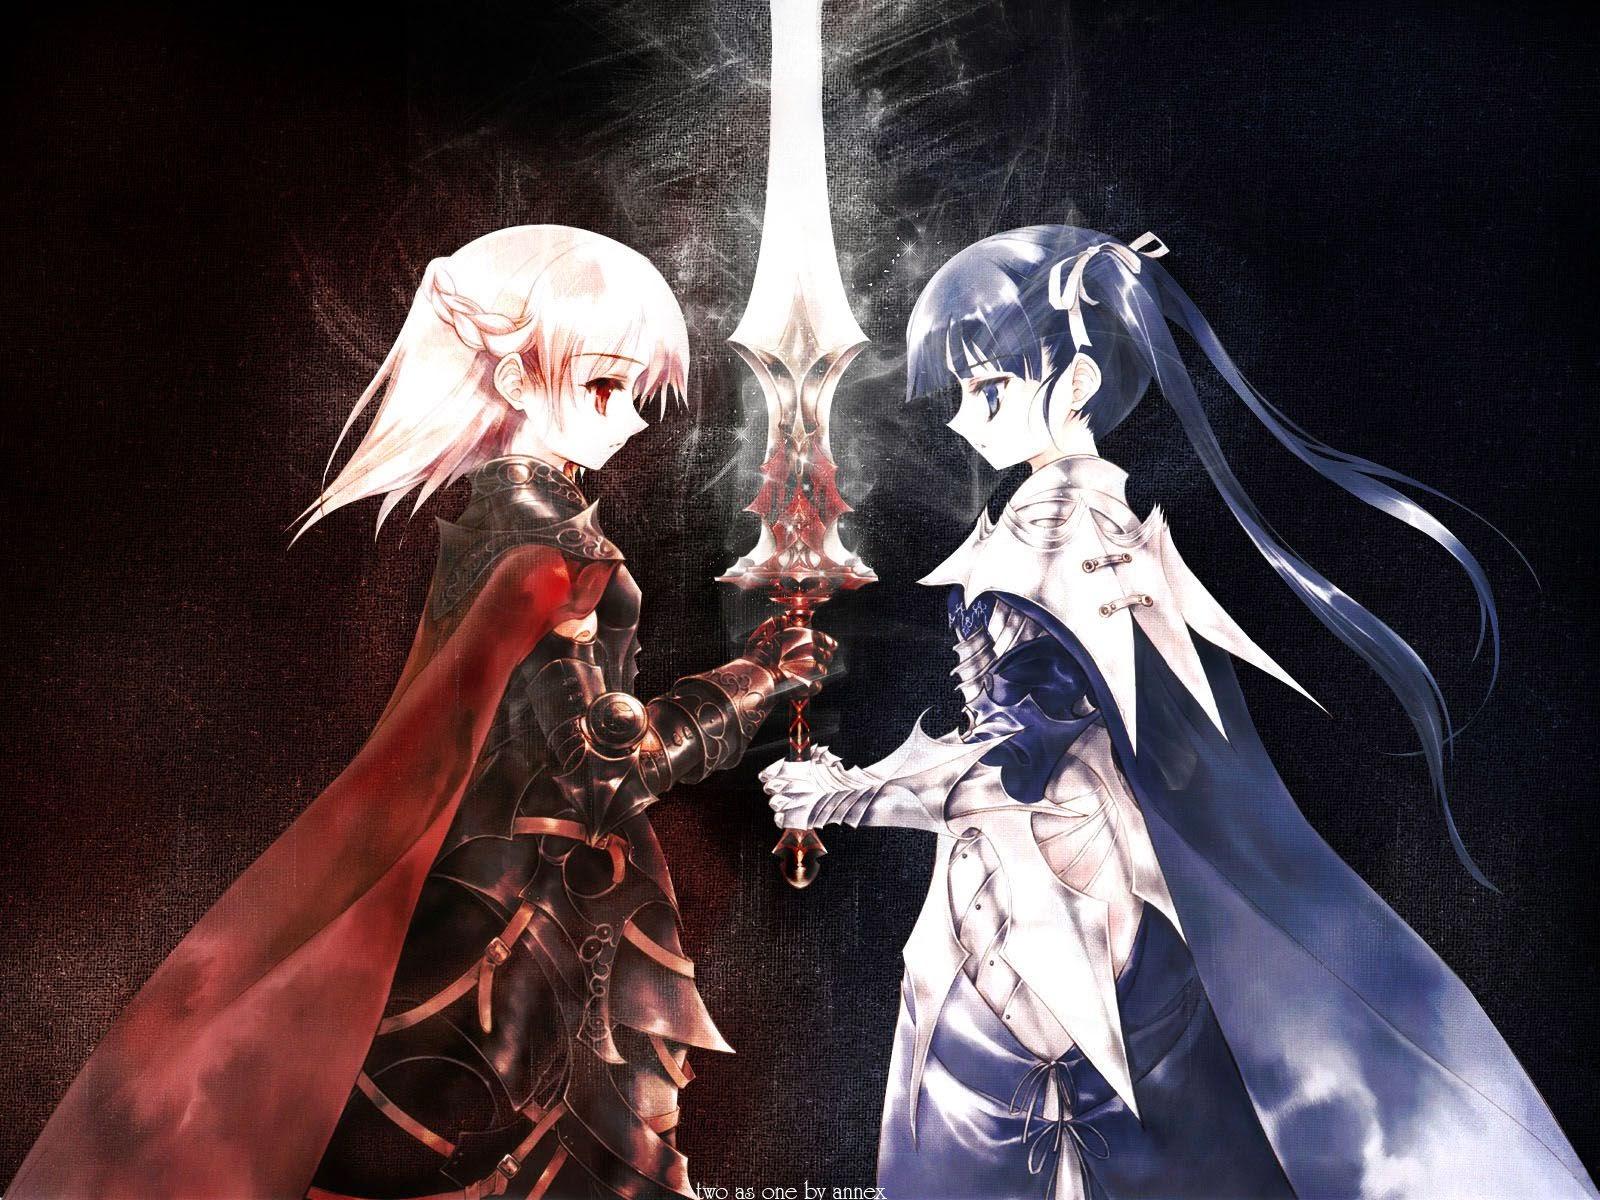 Depressing Anime: A Battle Between Light and Dark